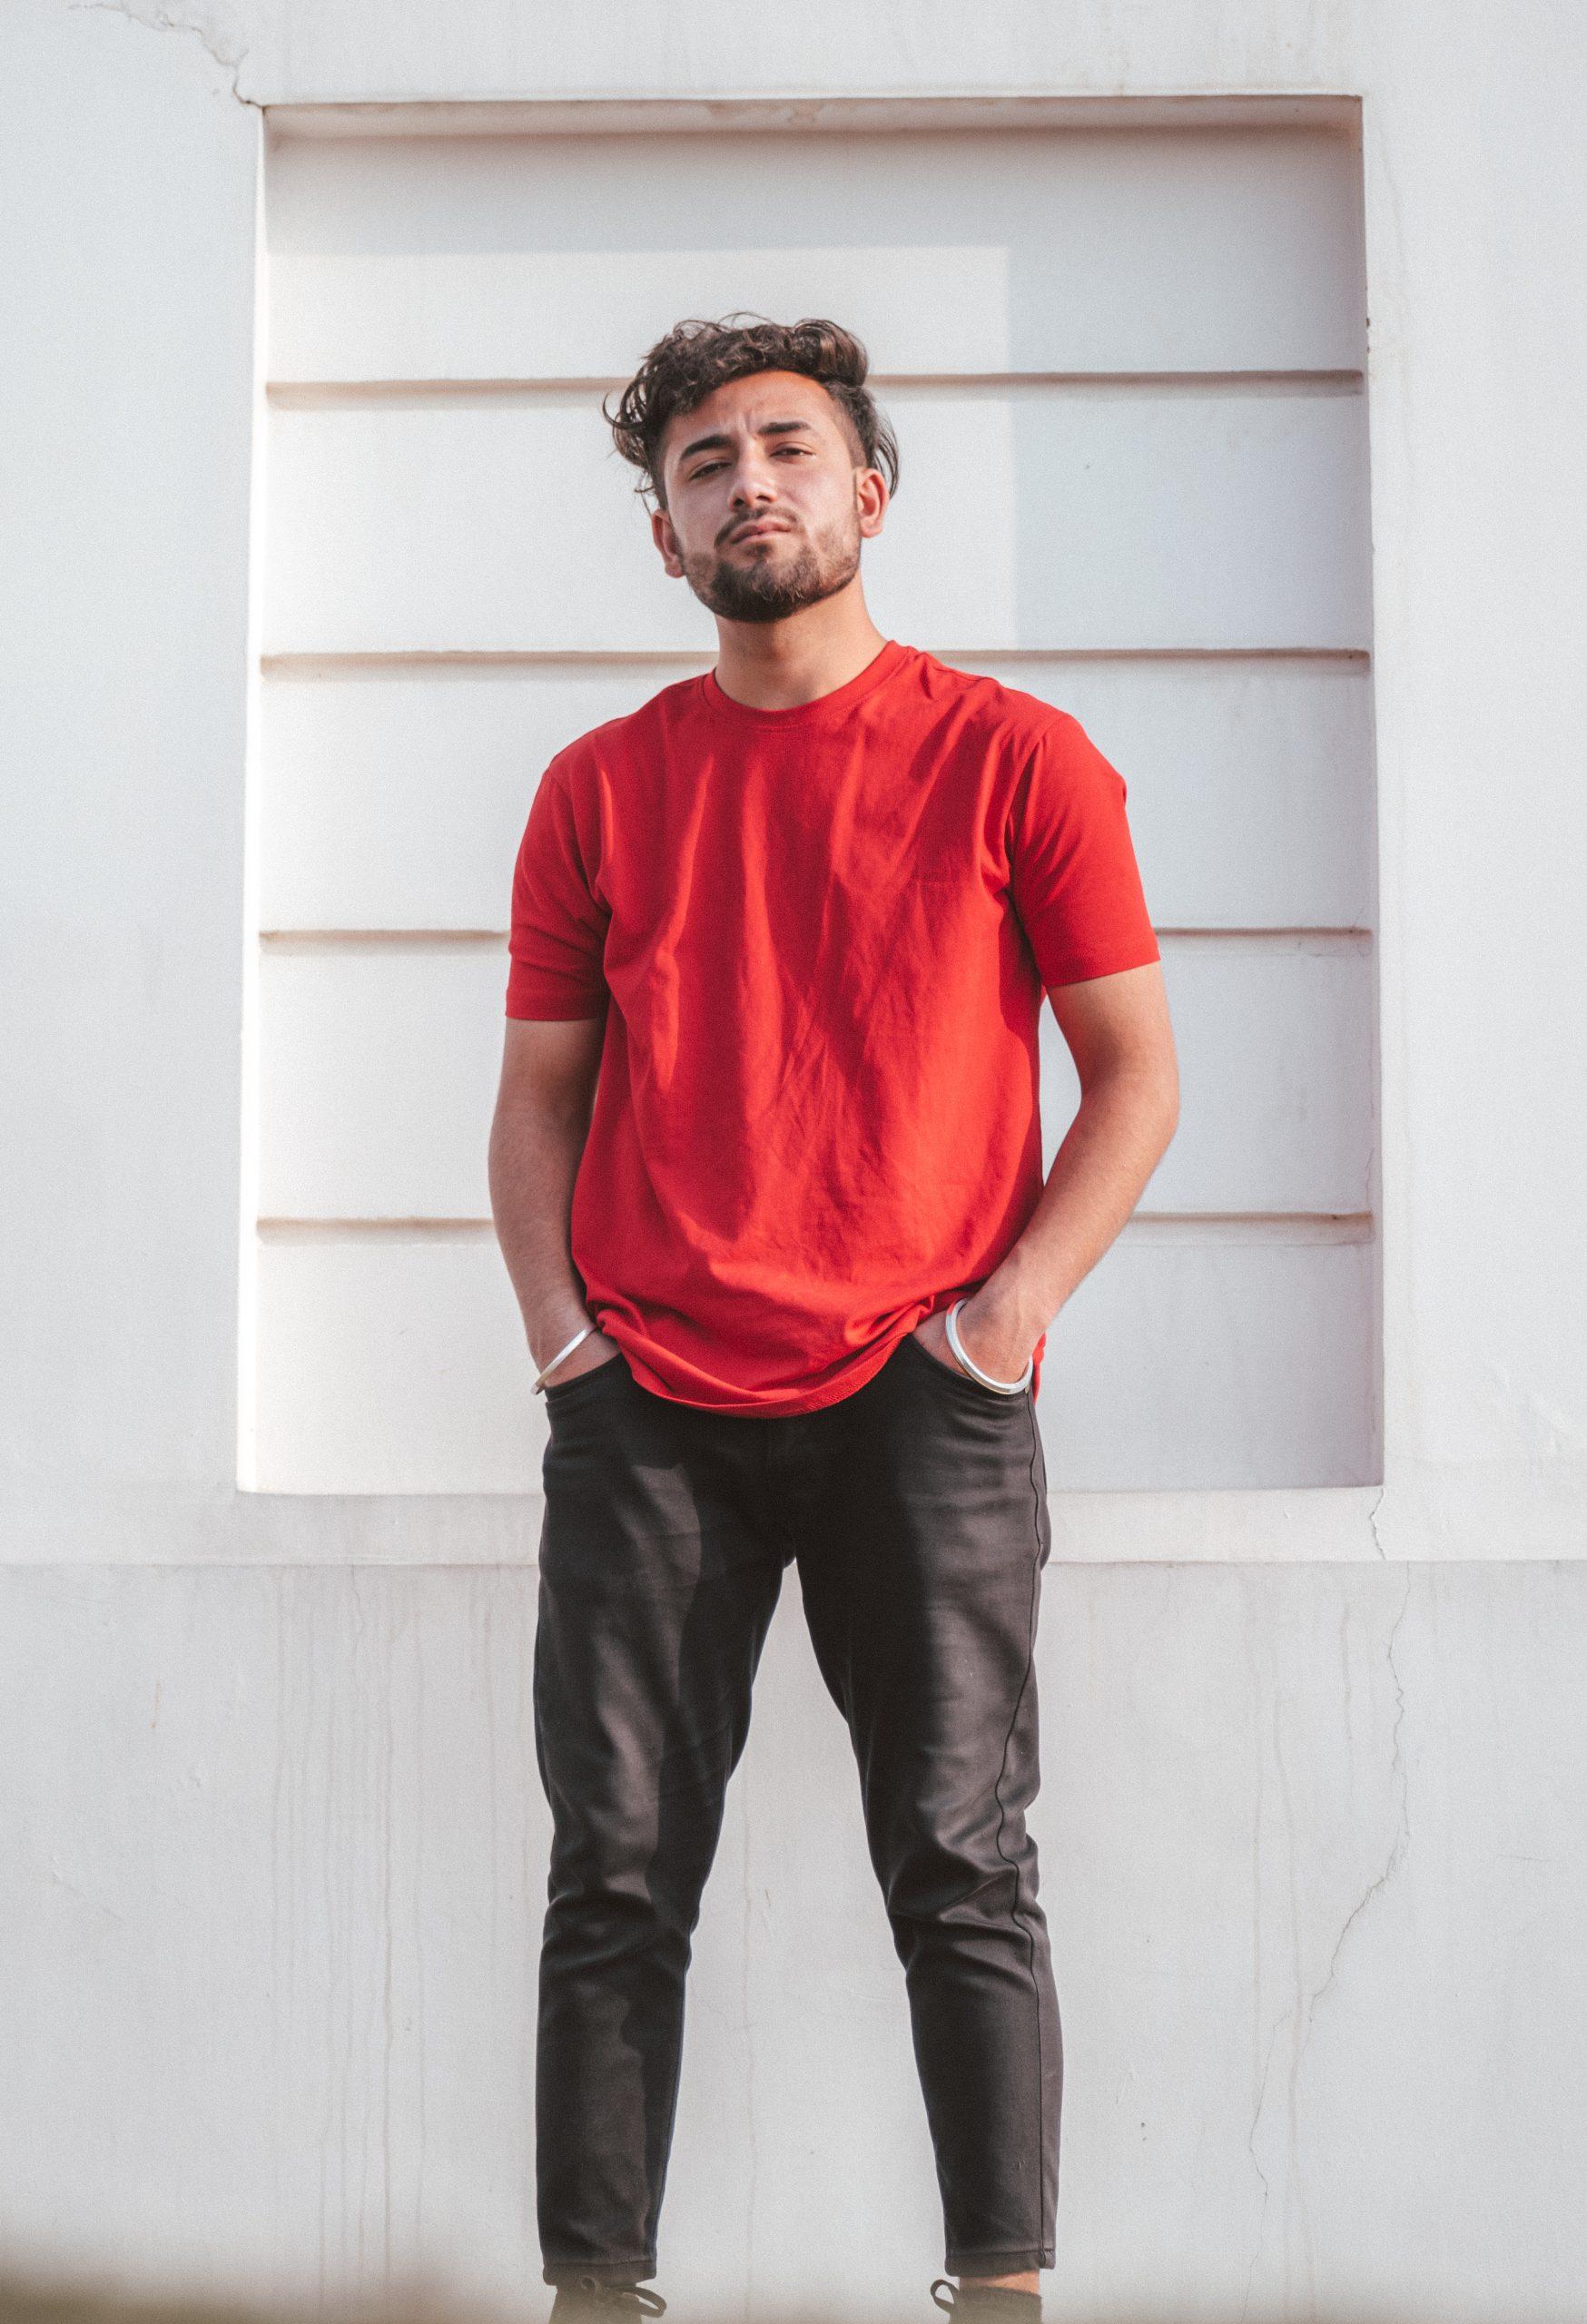 Boy posing against the wall